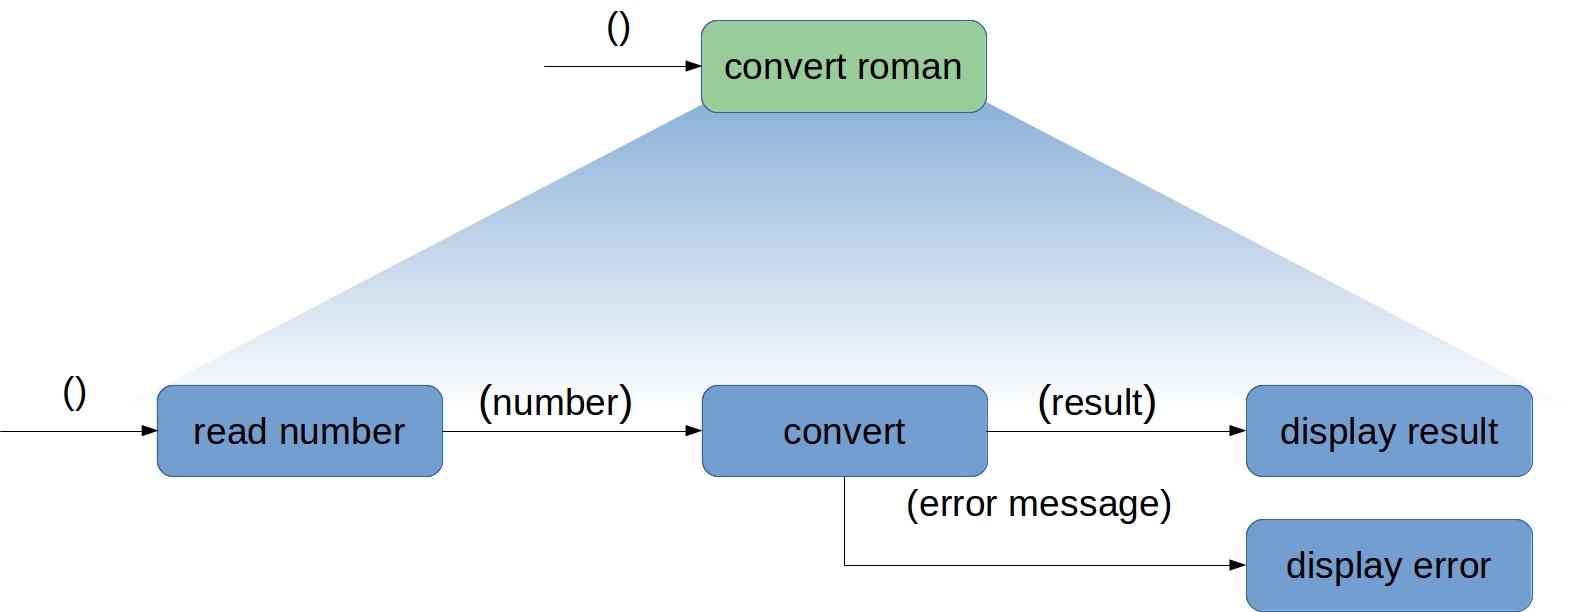 Flow-Design für convert roman. (Abb. 4)